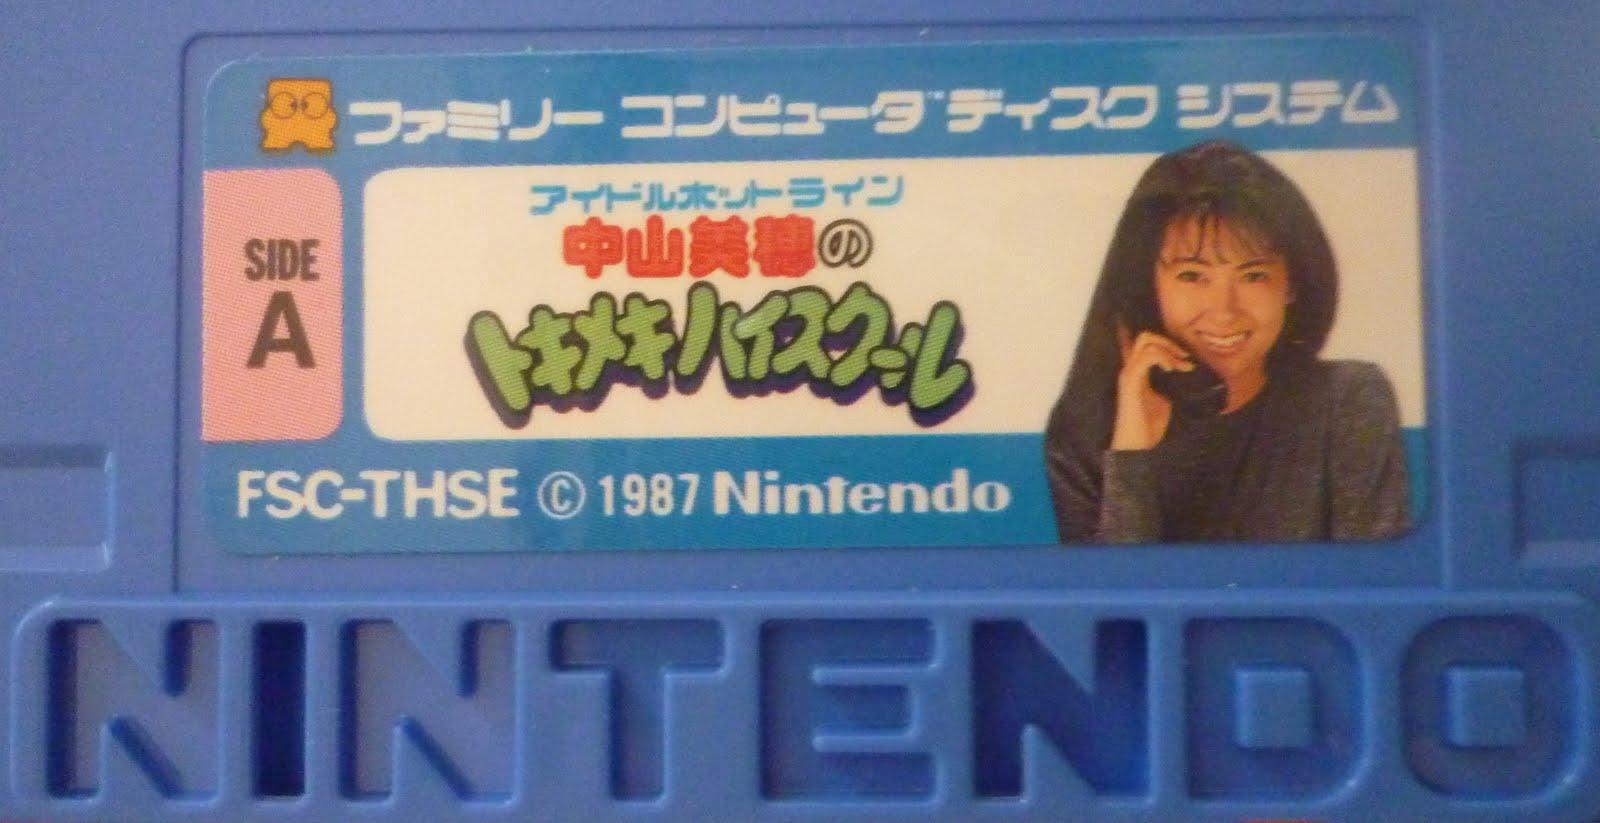 Famicomblog: 80s Girls and the Famicom: Miho Nakayama's Tokimeki